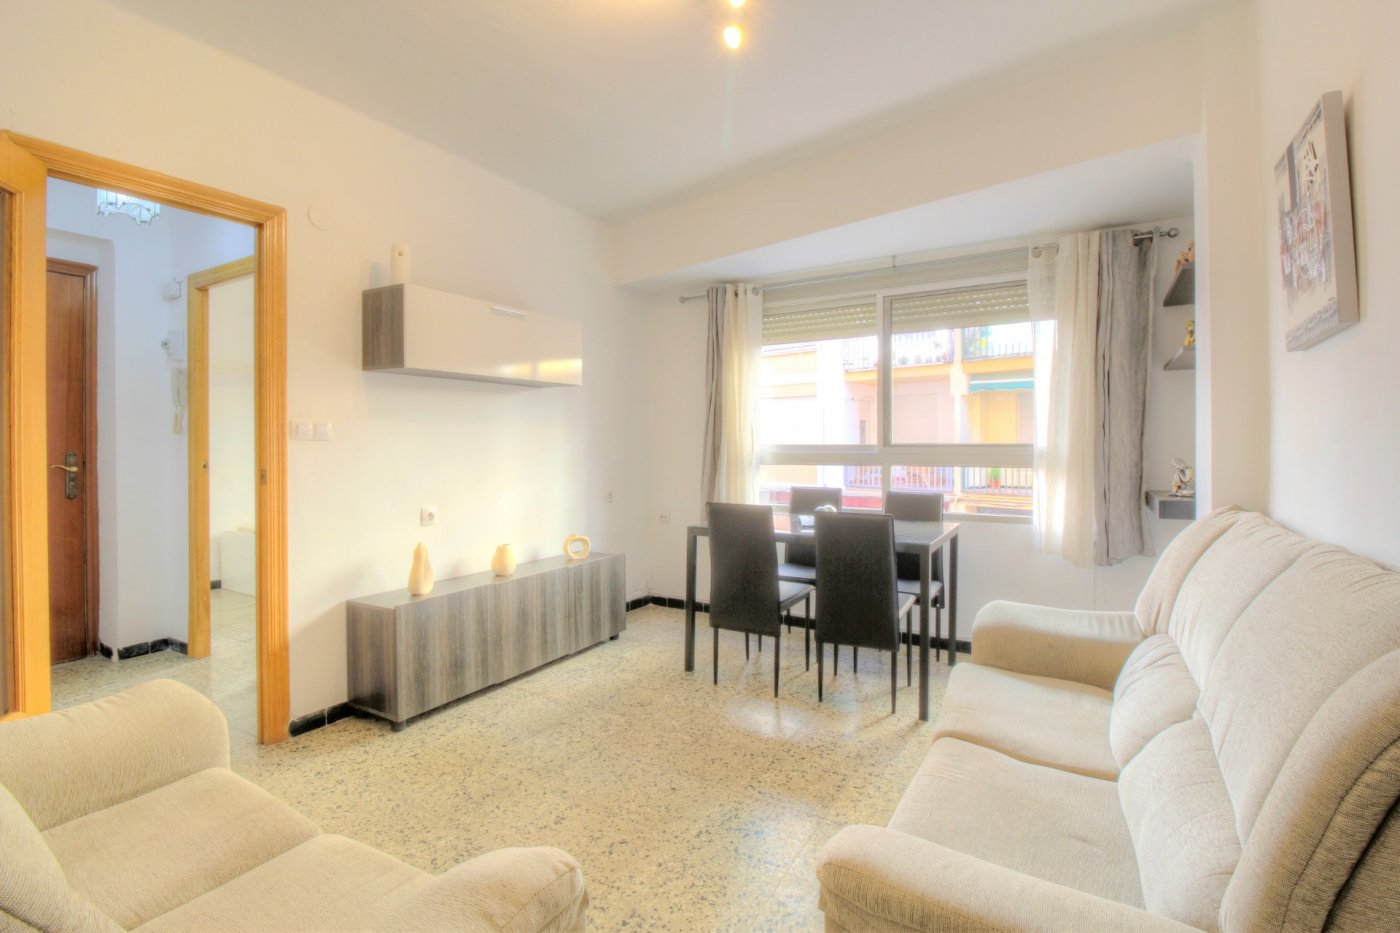 piso en castellon-castello-de-la-plana · corte-inglesestacion 58000€